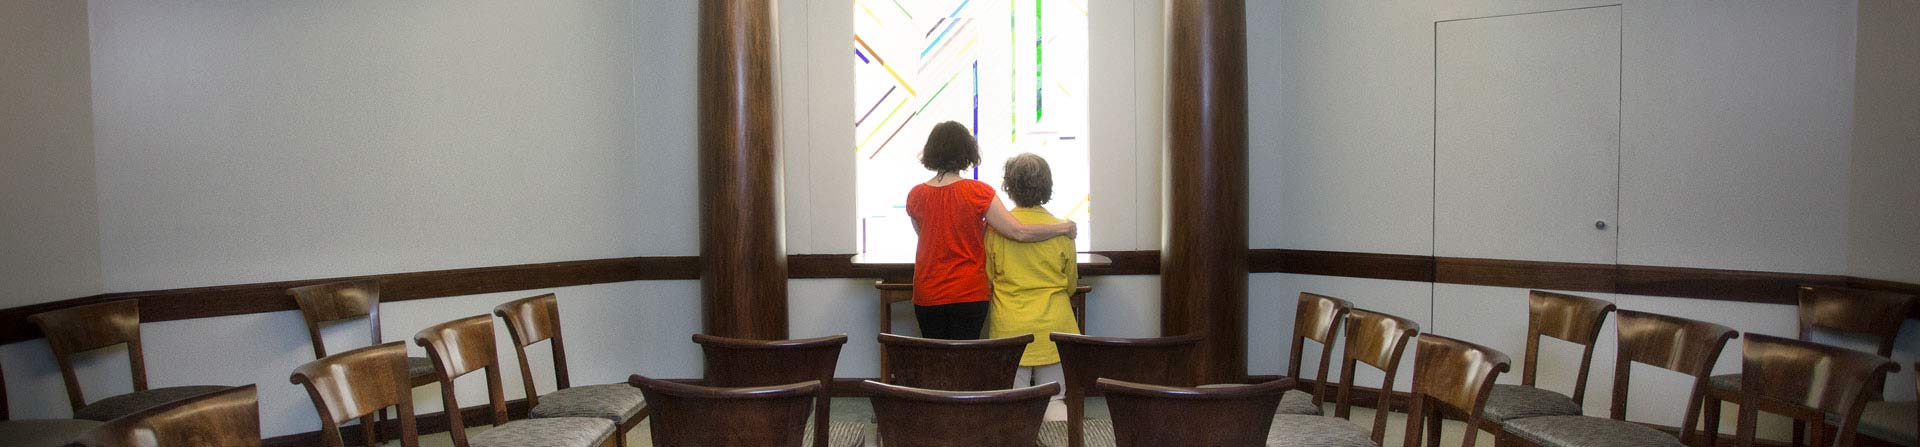 Spiritual Support | Hospital Chaplains | UVA Health